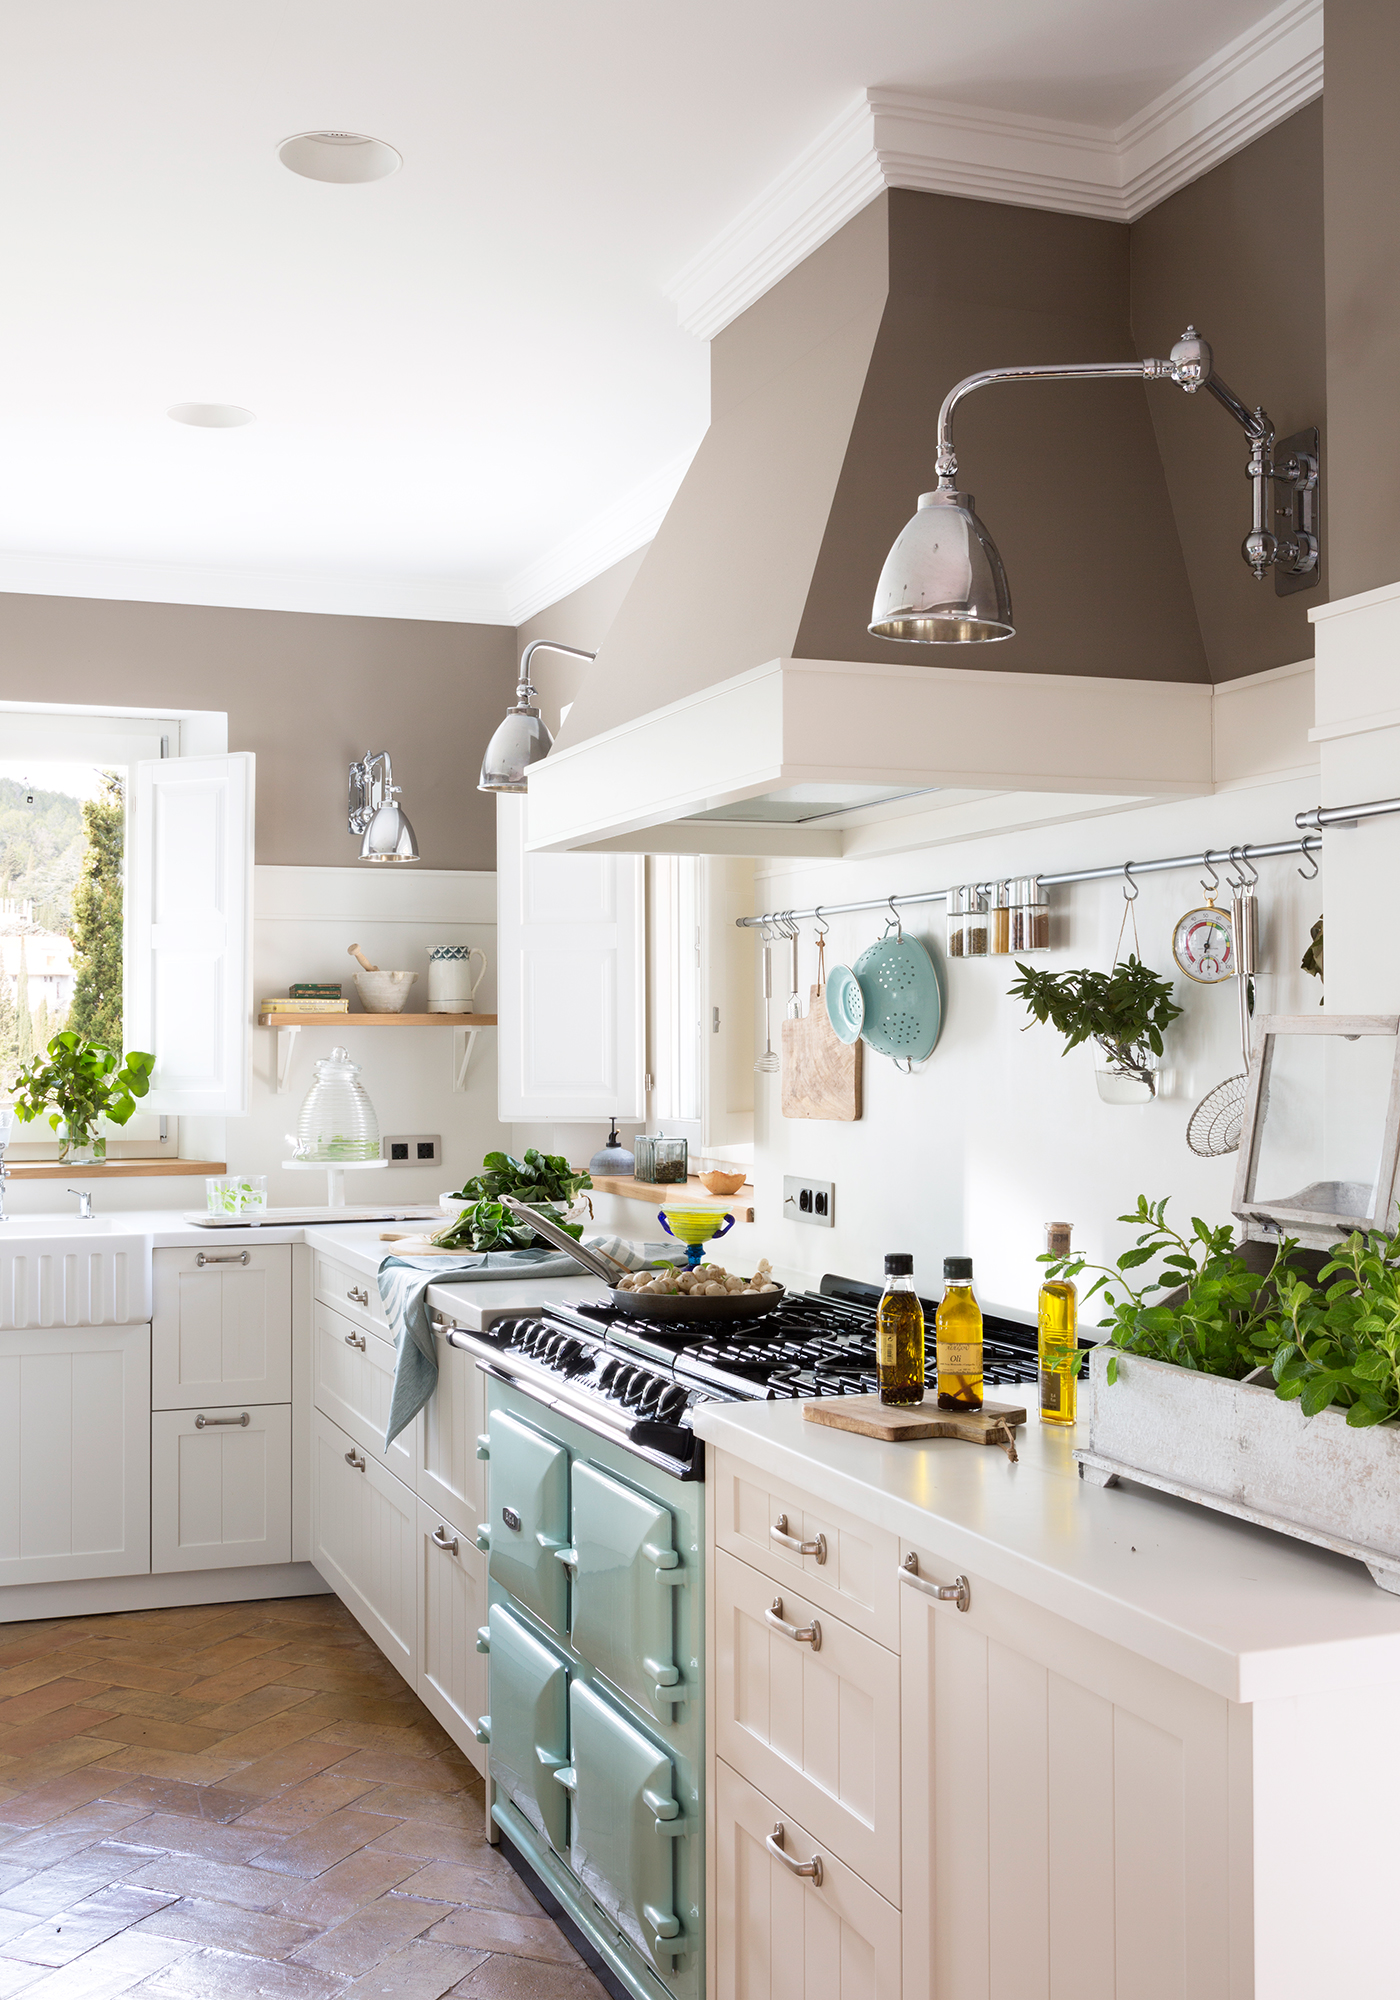 Muebles de cocina elmueble for Muebles de cocina gris